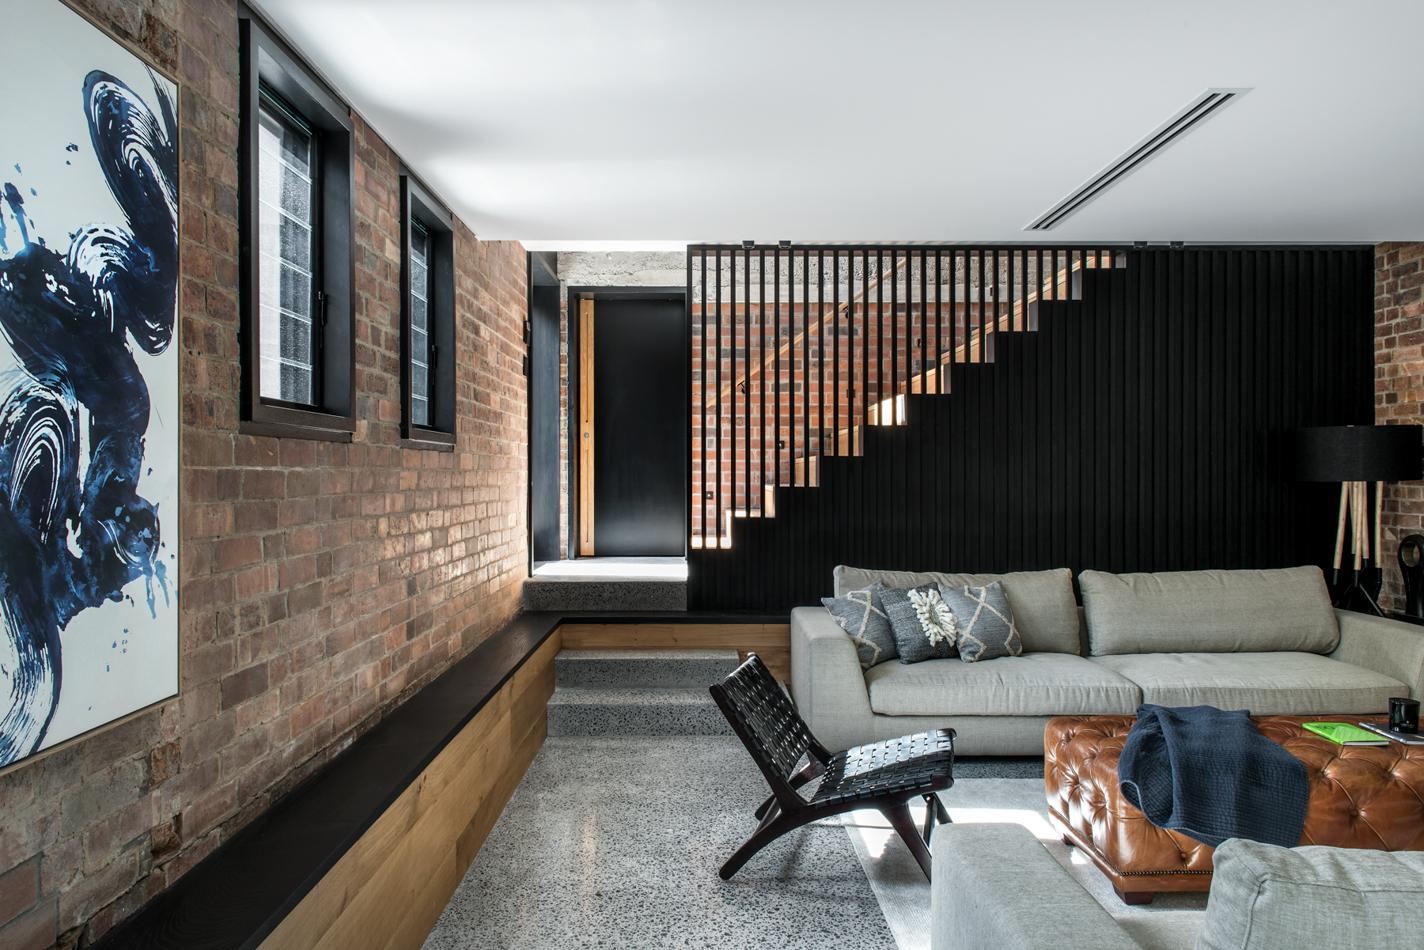 the-terrace-shaun-lockyer-architects-the-design-emotive-2.jpg